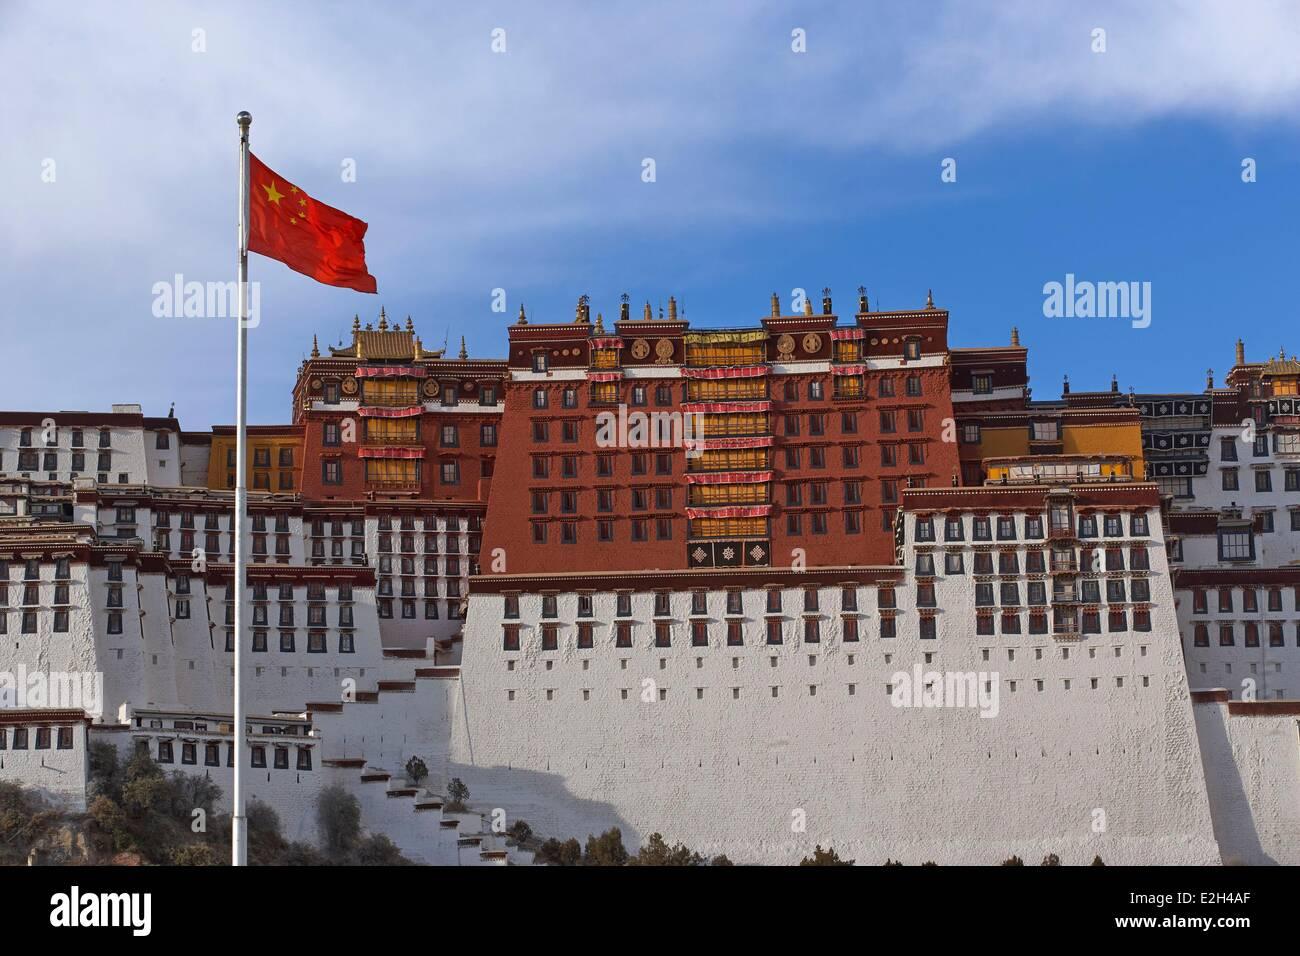 China Tibet Lhassa Potala palace and chinese flag - Stock Image